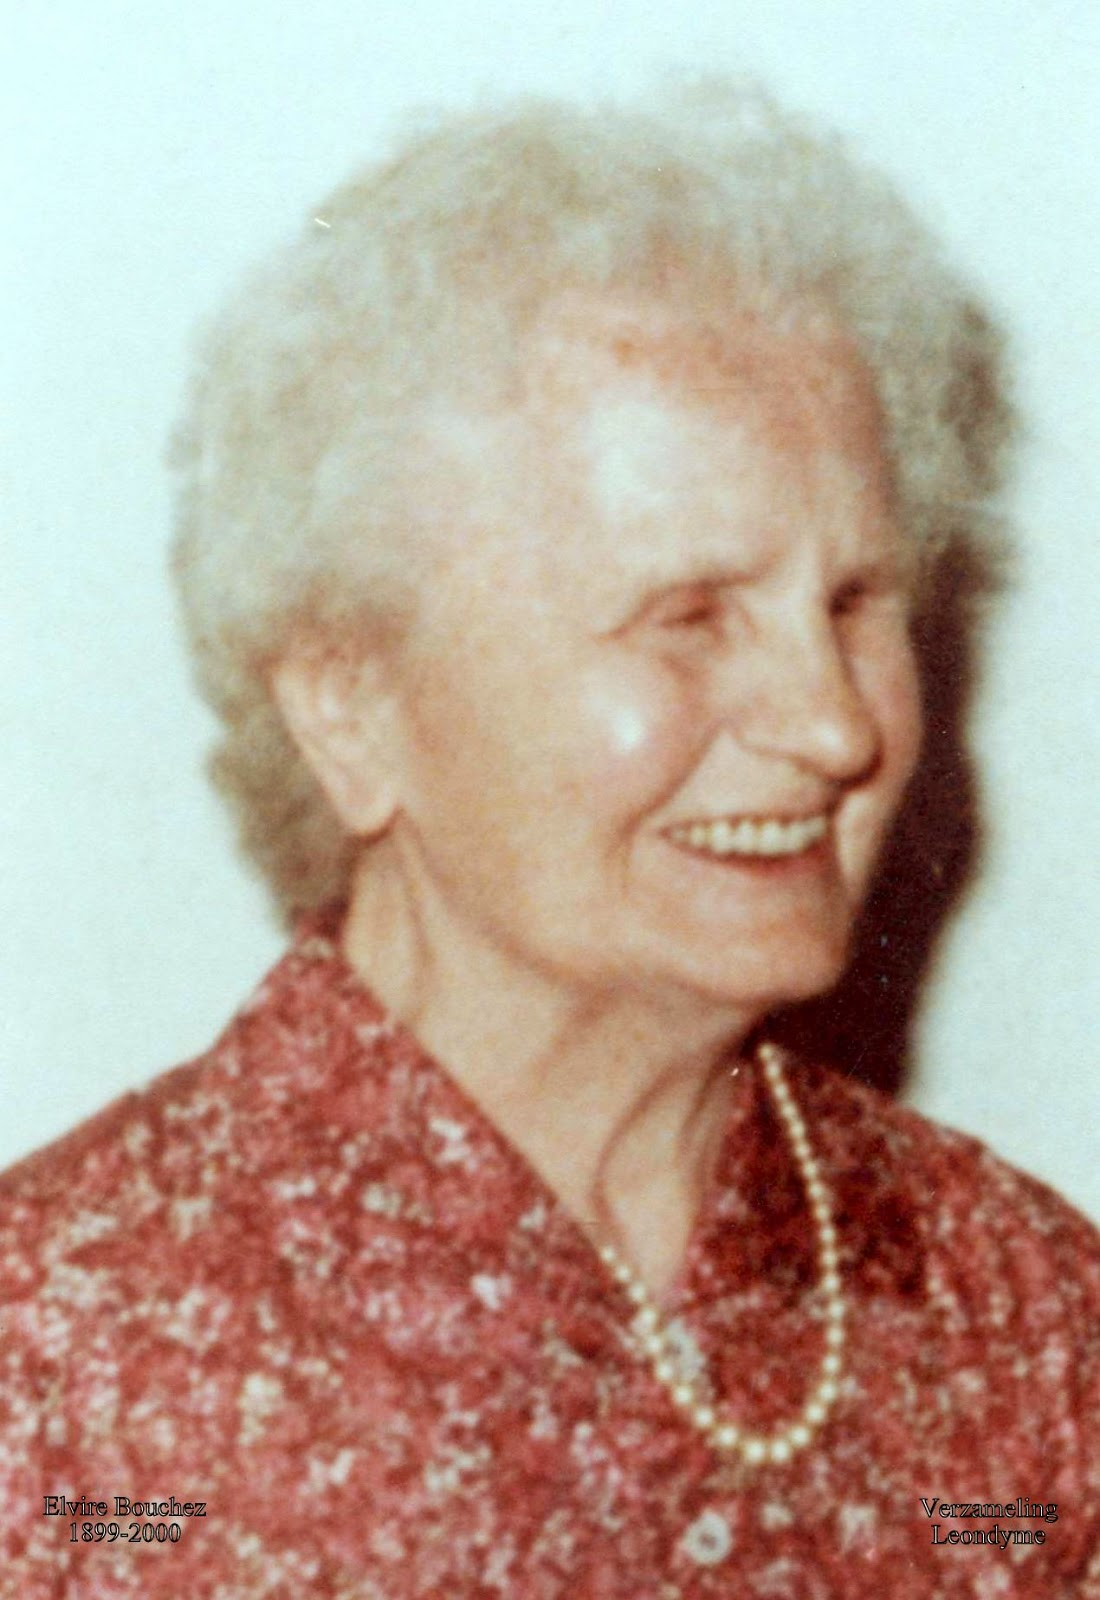 Bidprentje, Elvire Bouchez 1899-2000